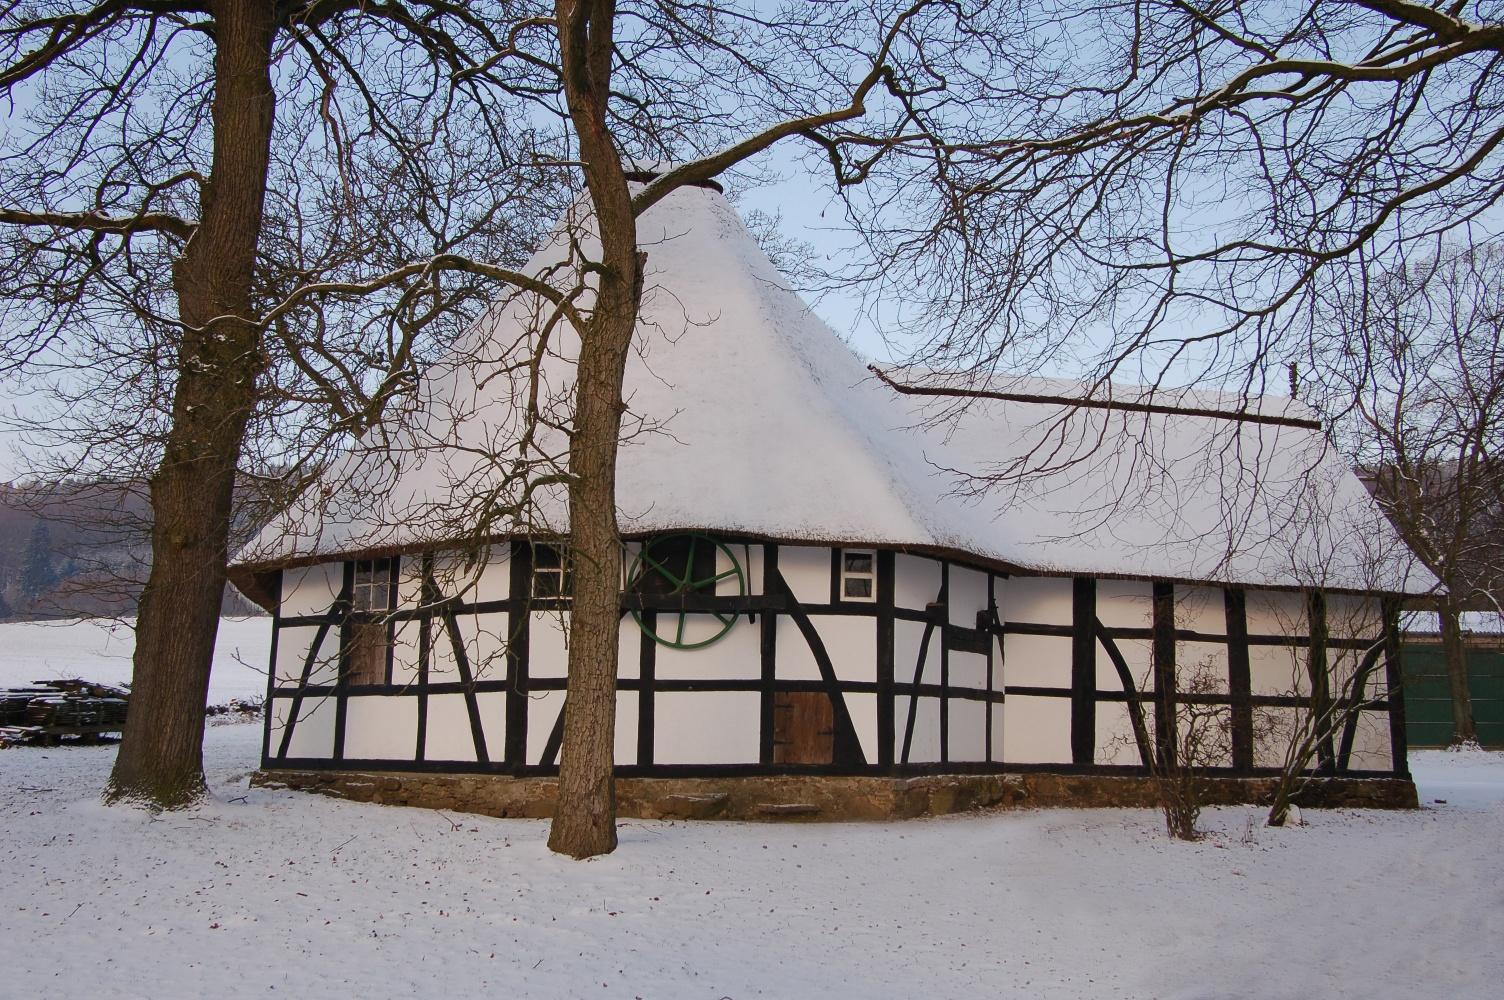 Rossmühle Oberbauerschaft